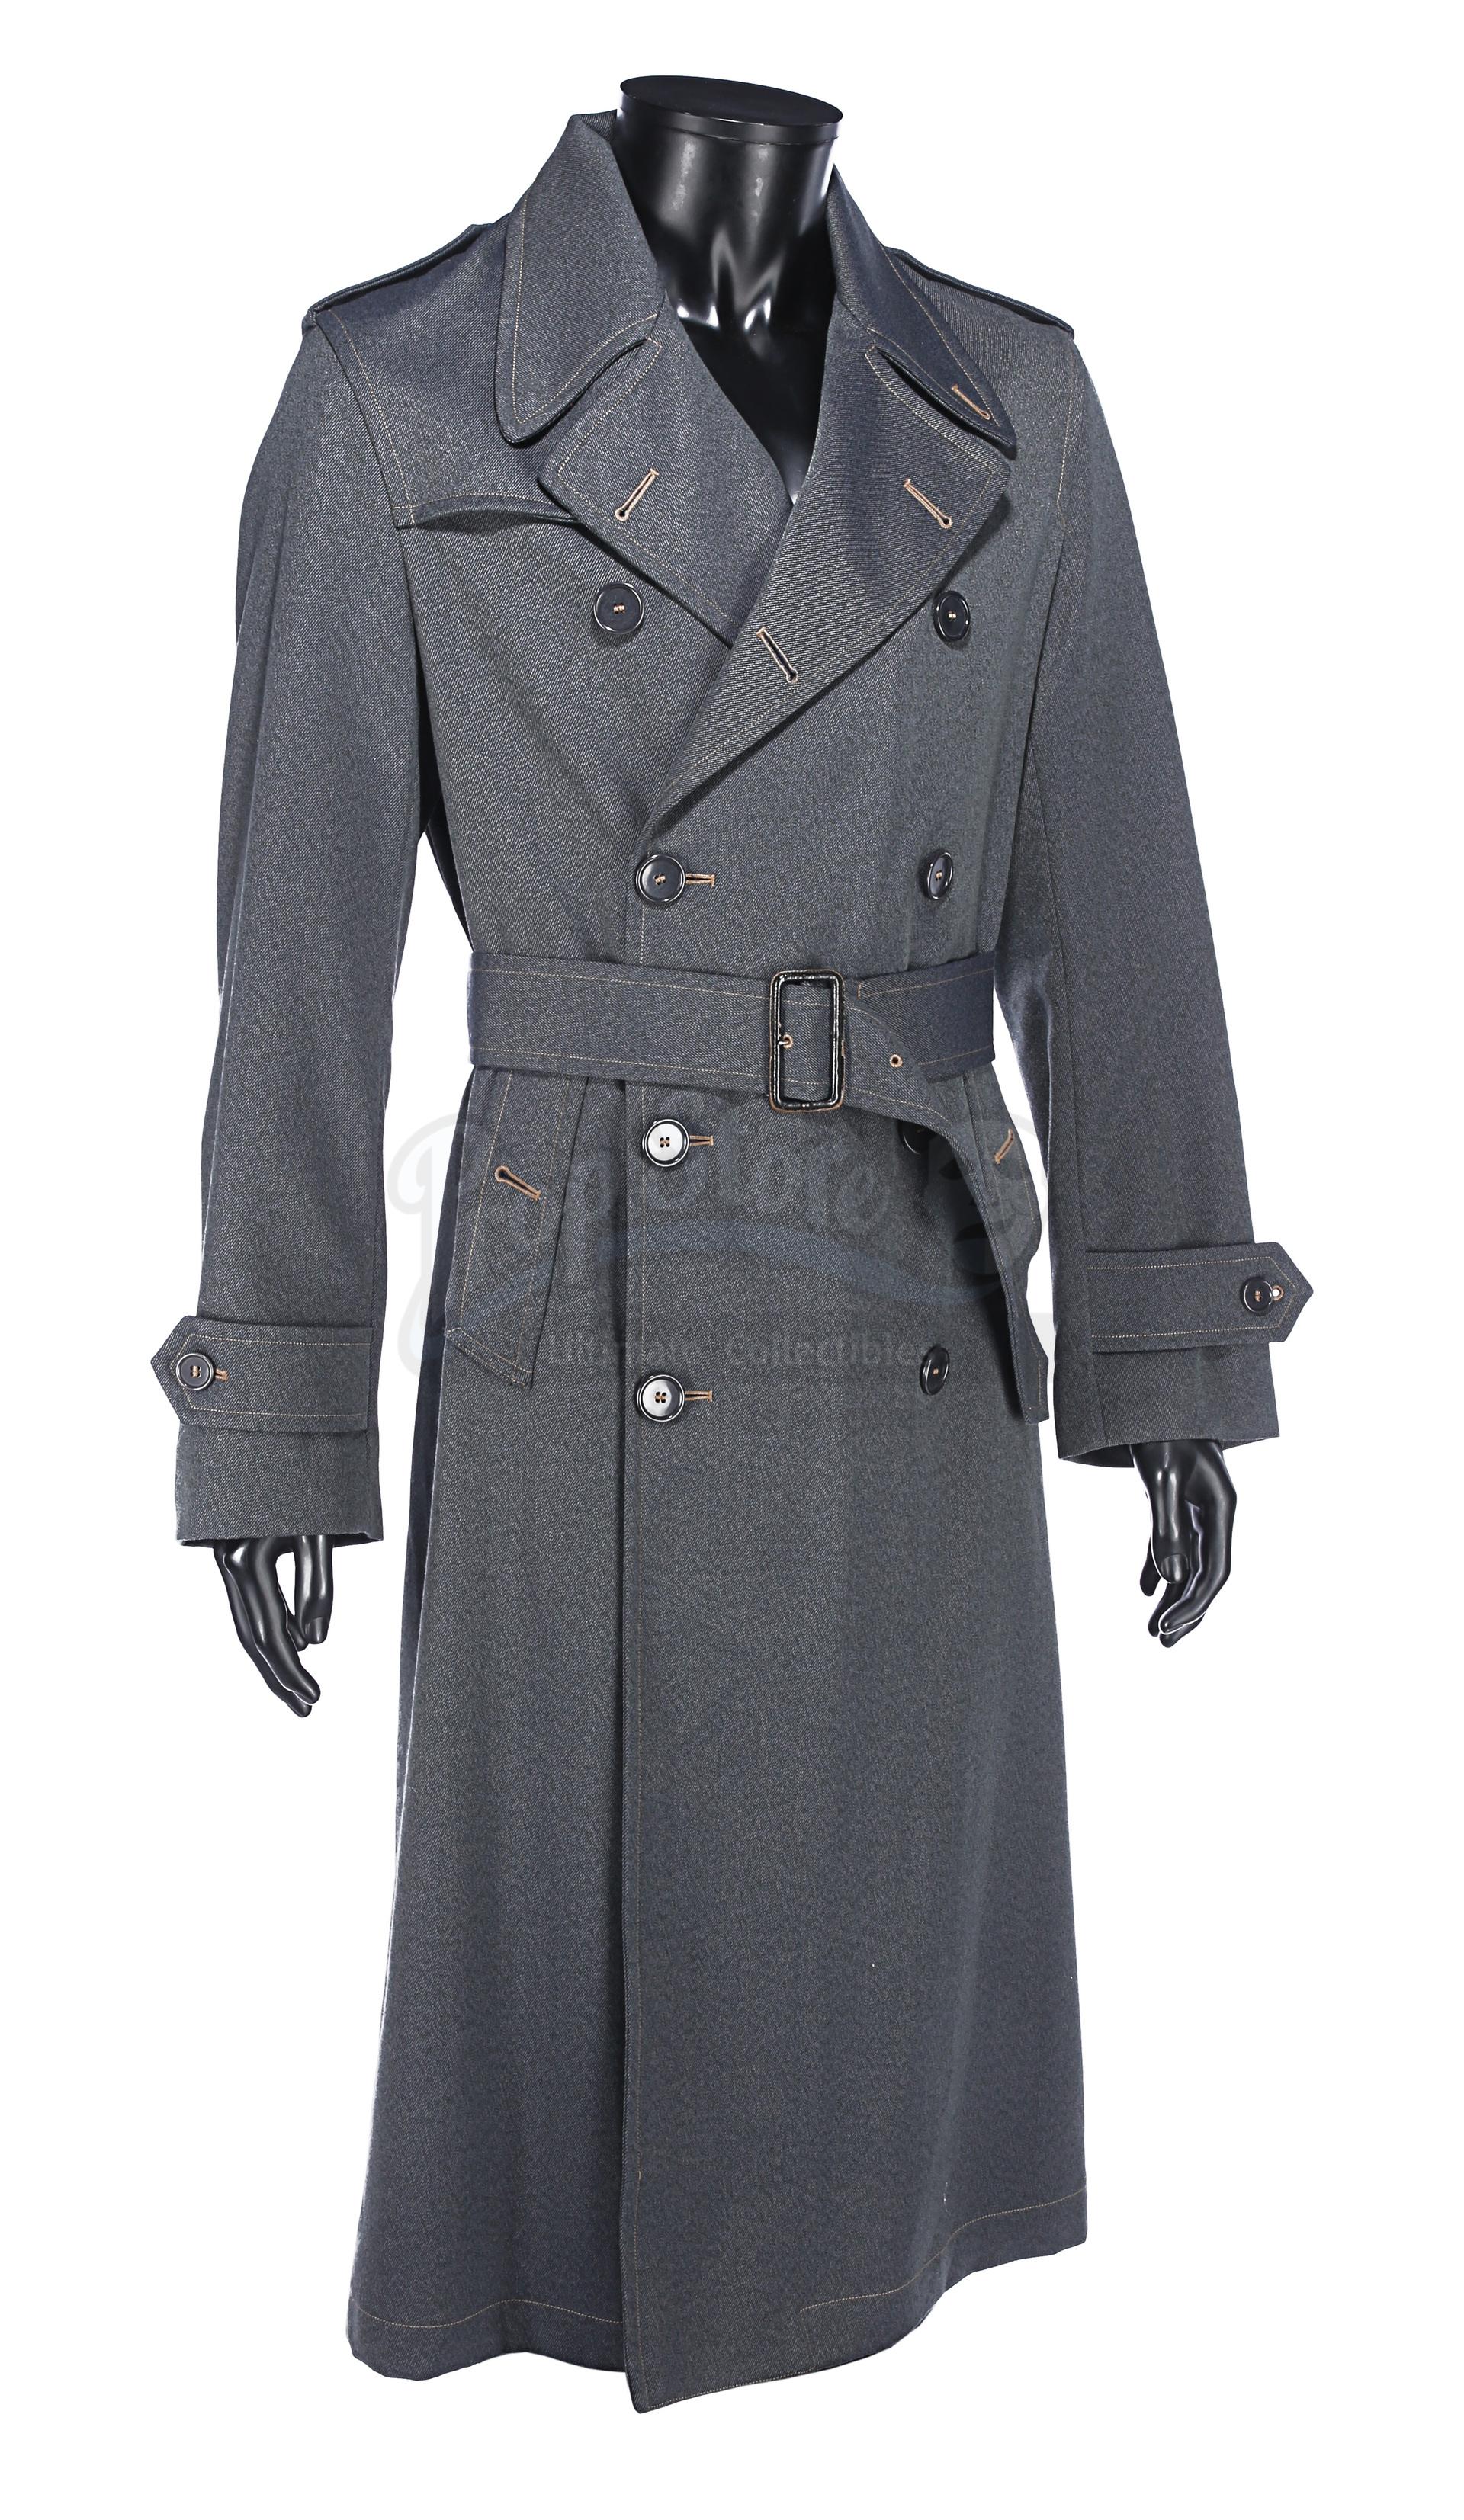 ALLIED (2016) - Max's (Brad Pitt) Military Overcoat - Image 2 of 17